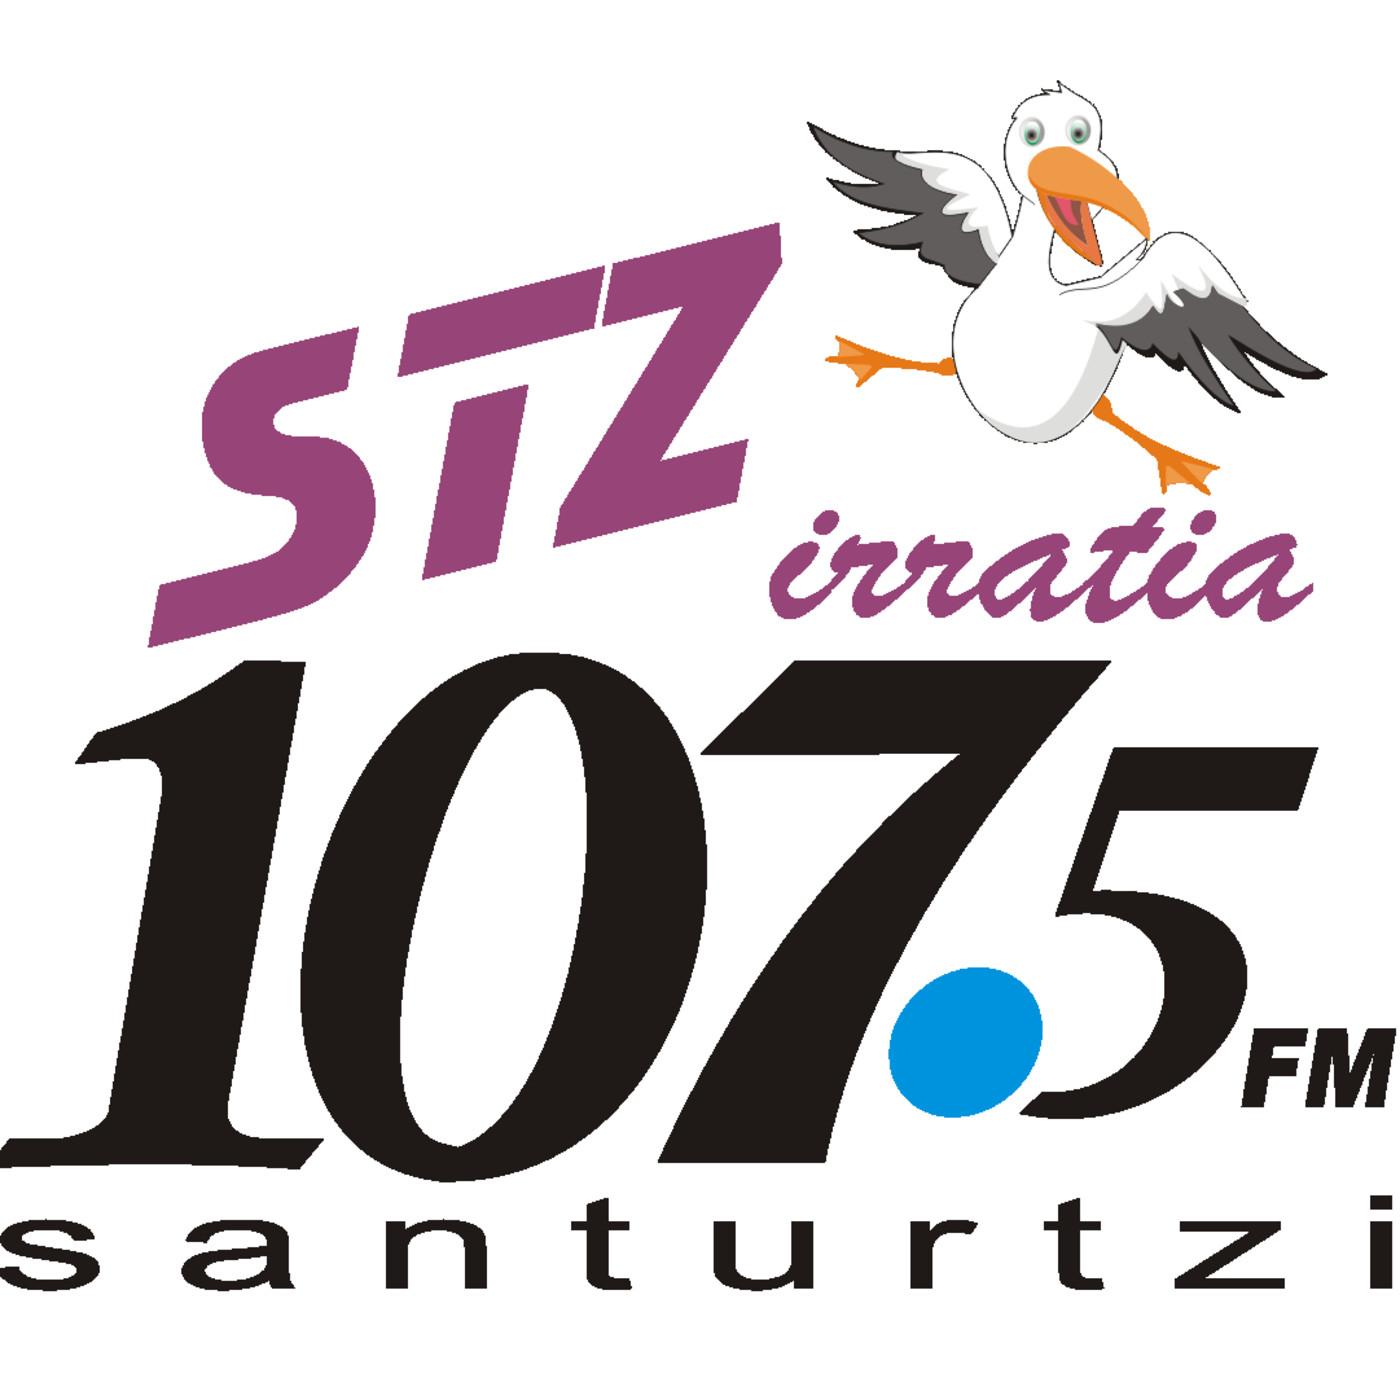 18-11-2017 promo potro eguna 171019